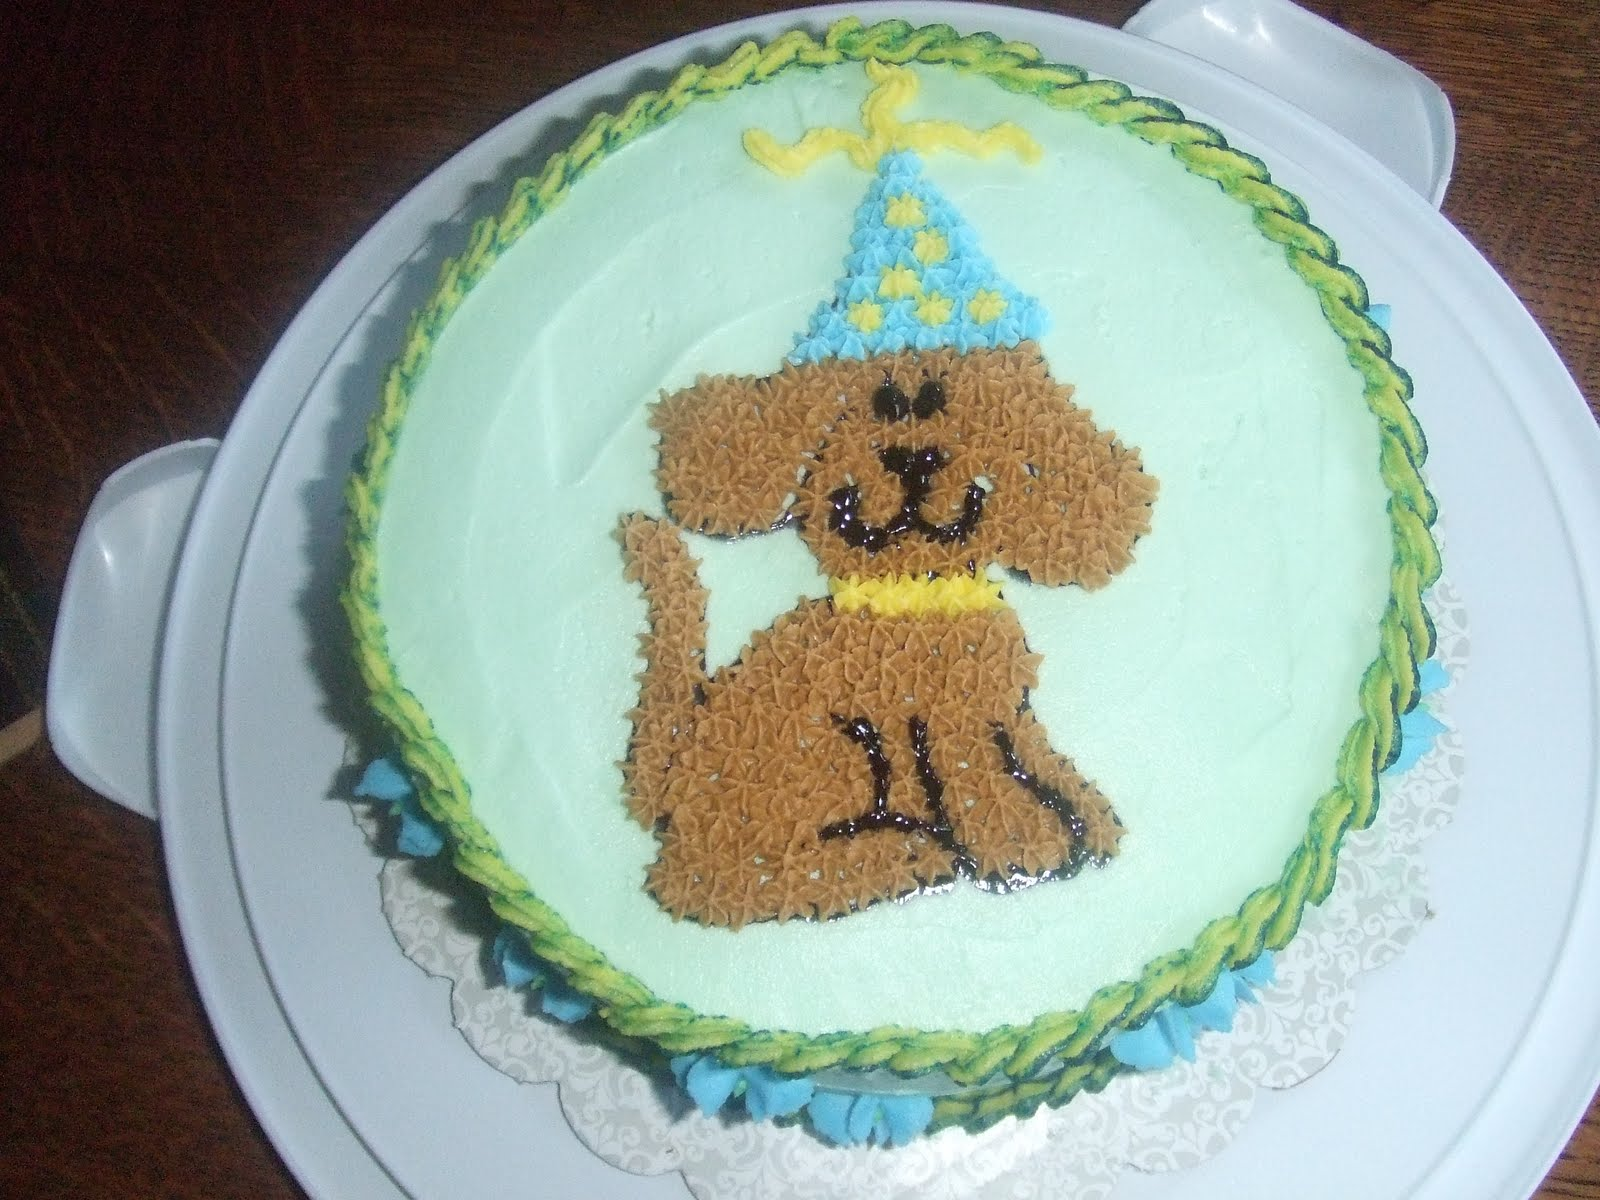 Cake Art By Jenn : Cake Art by Jen